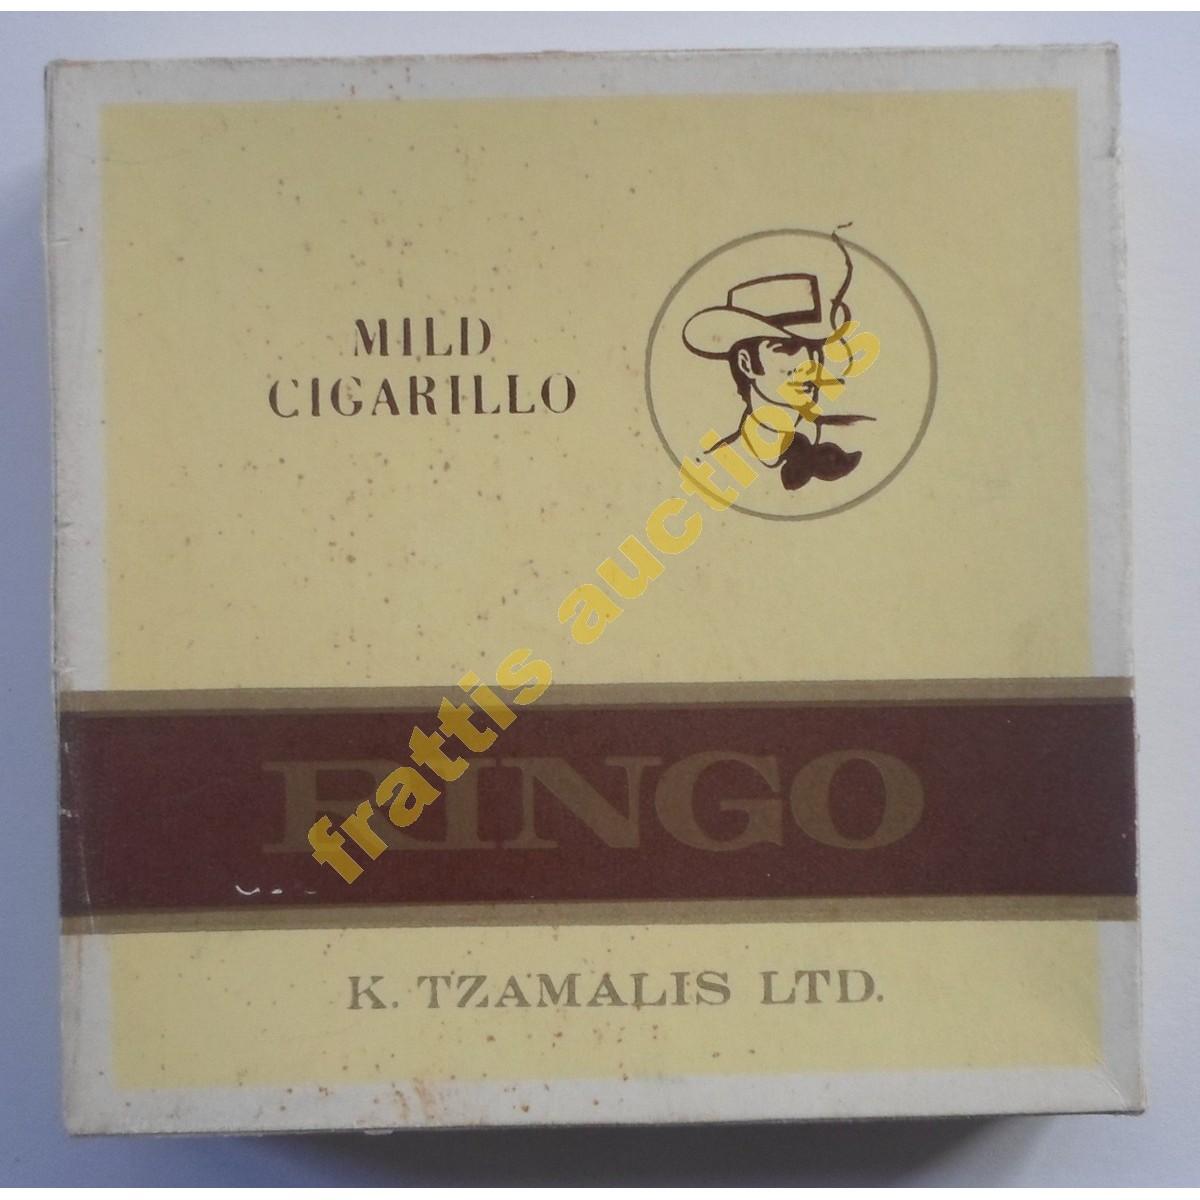 Vintage χάρτινο πακέτο των 20 cigarillos , Ringo, Ελλάδα. K TZAMALIS LTD